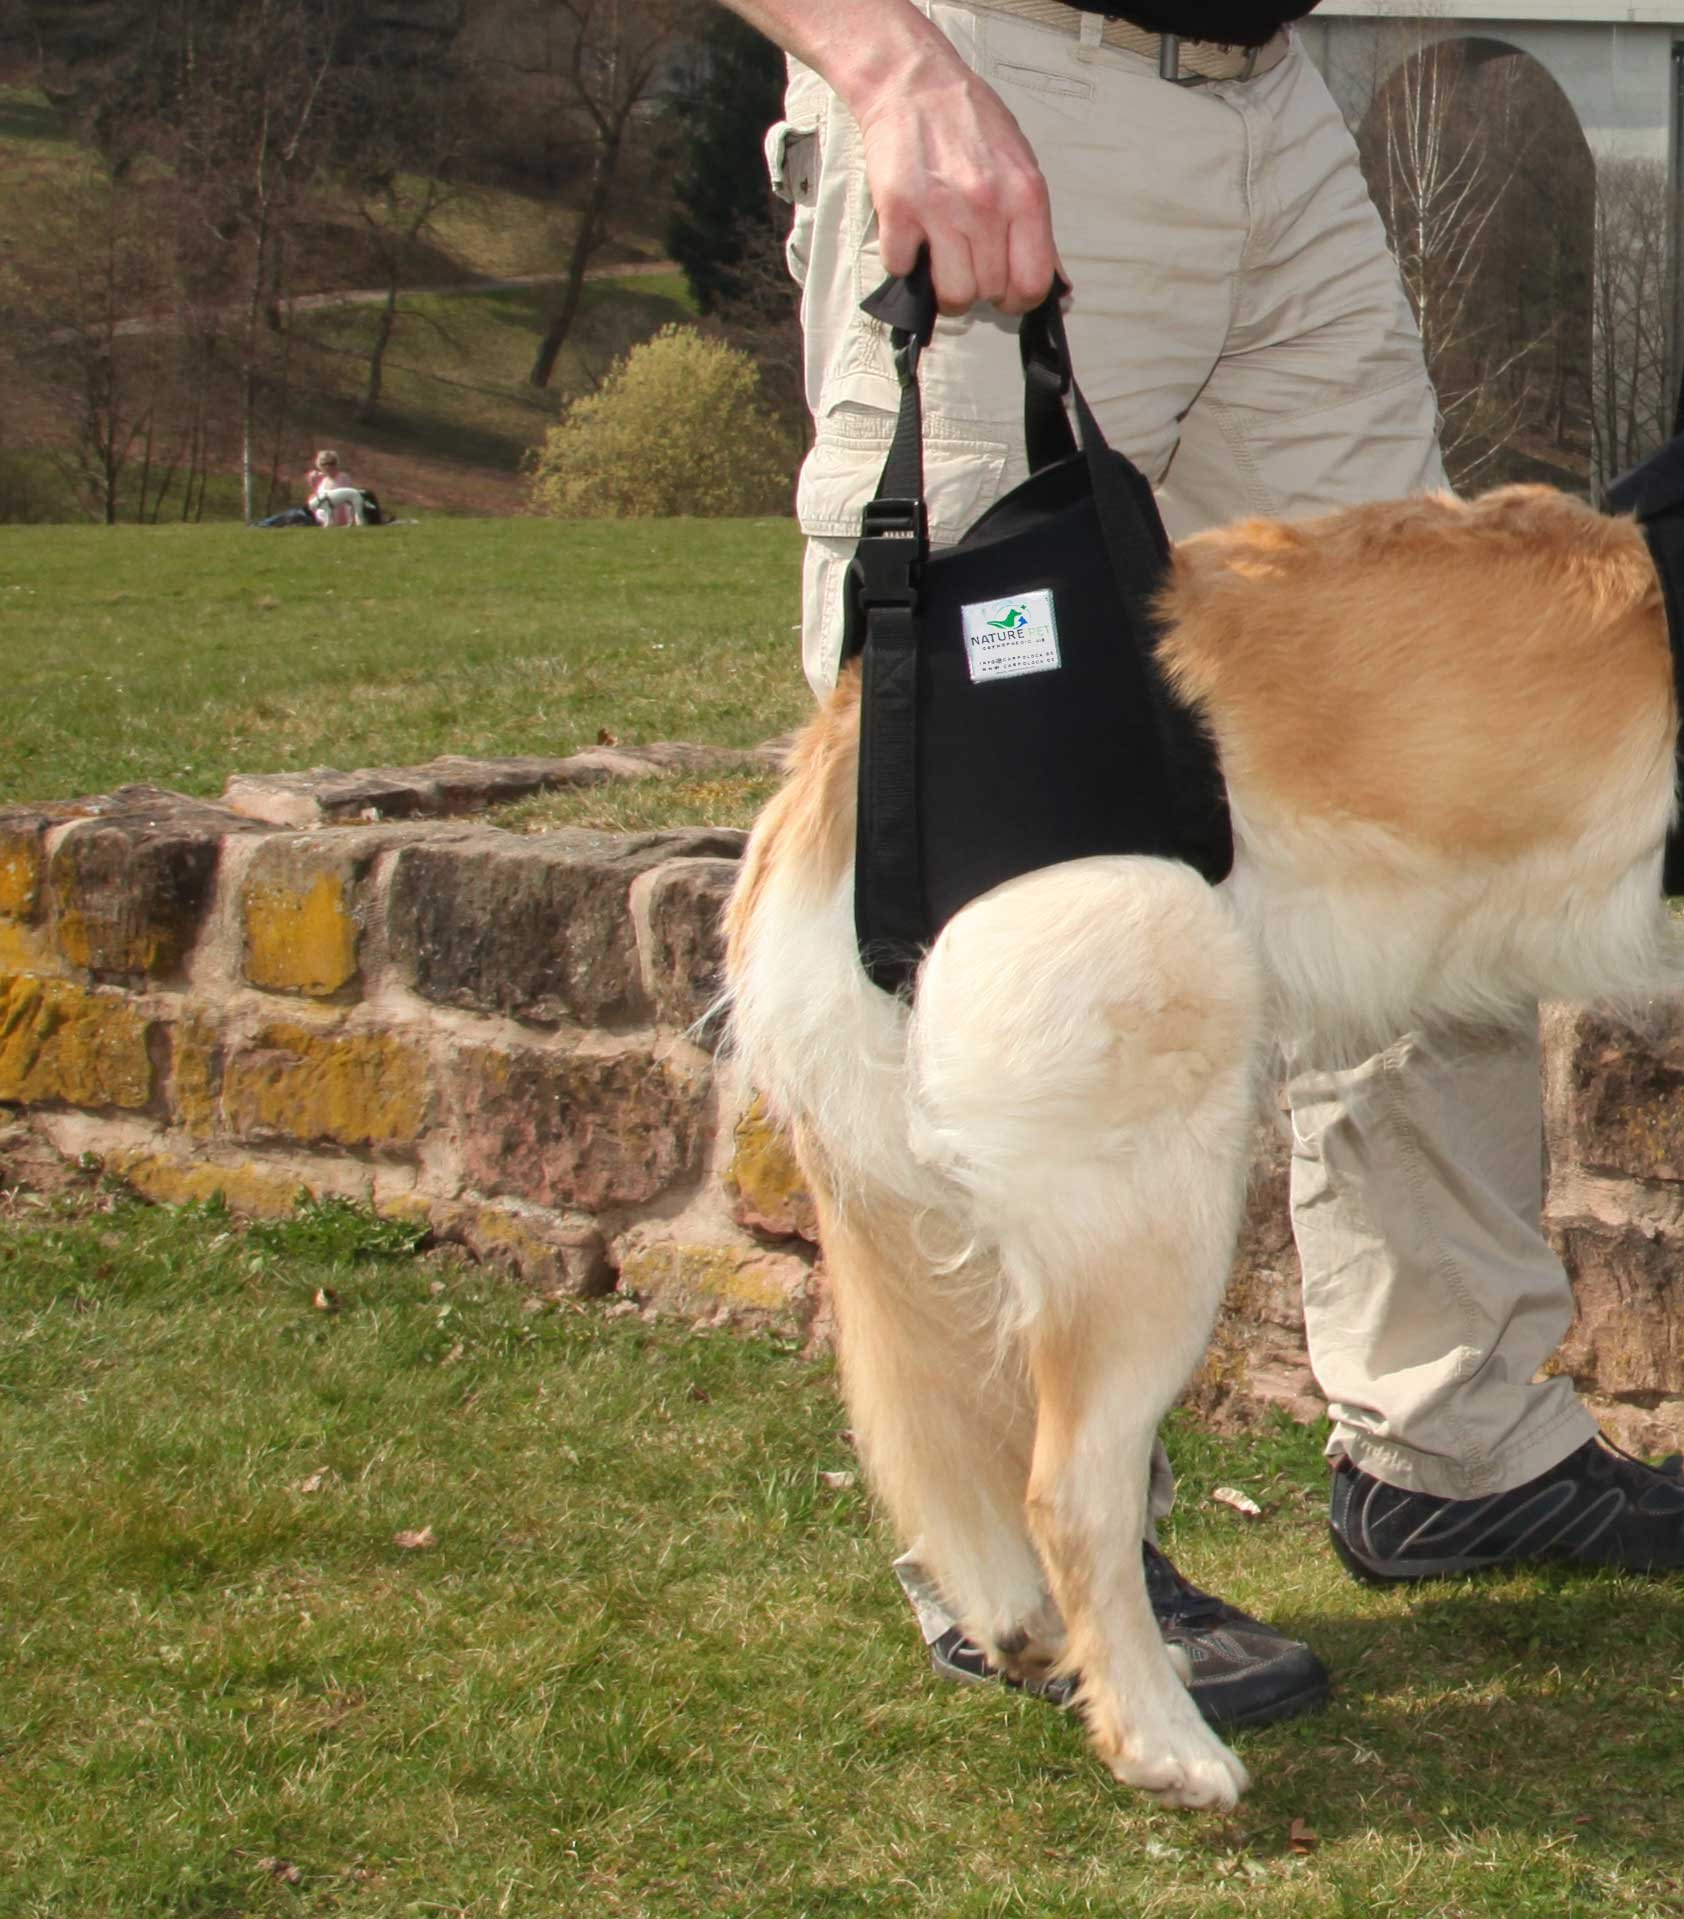 Pfaff Medical Dog Rear Carrier / Lifting Harness (Large)